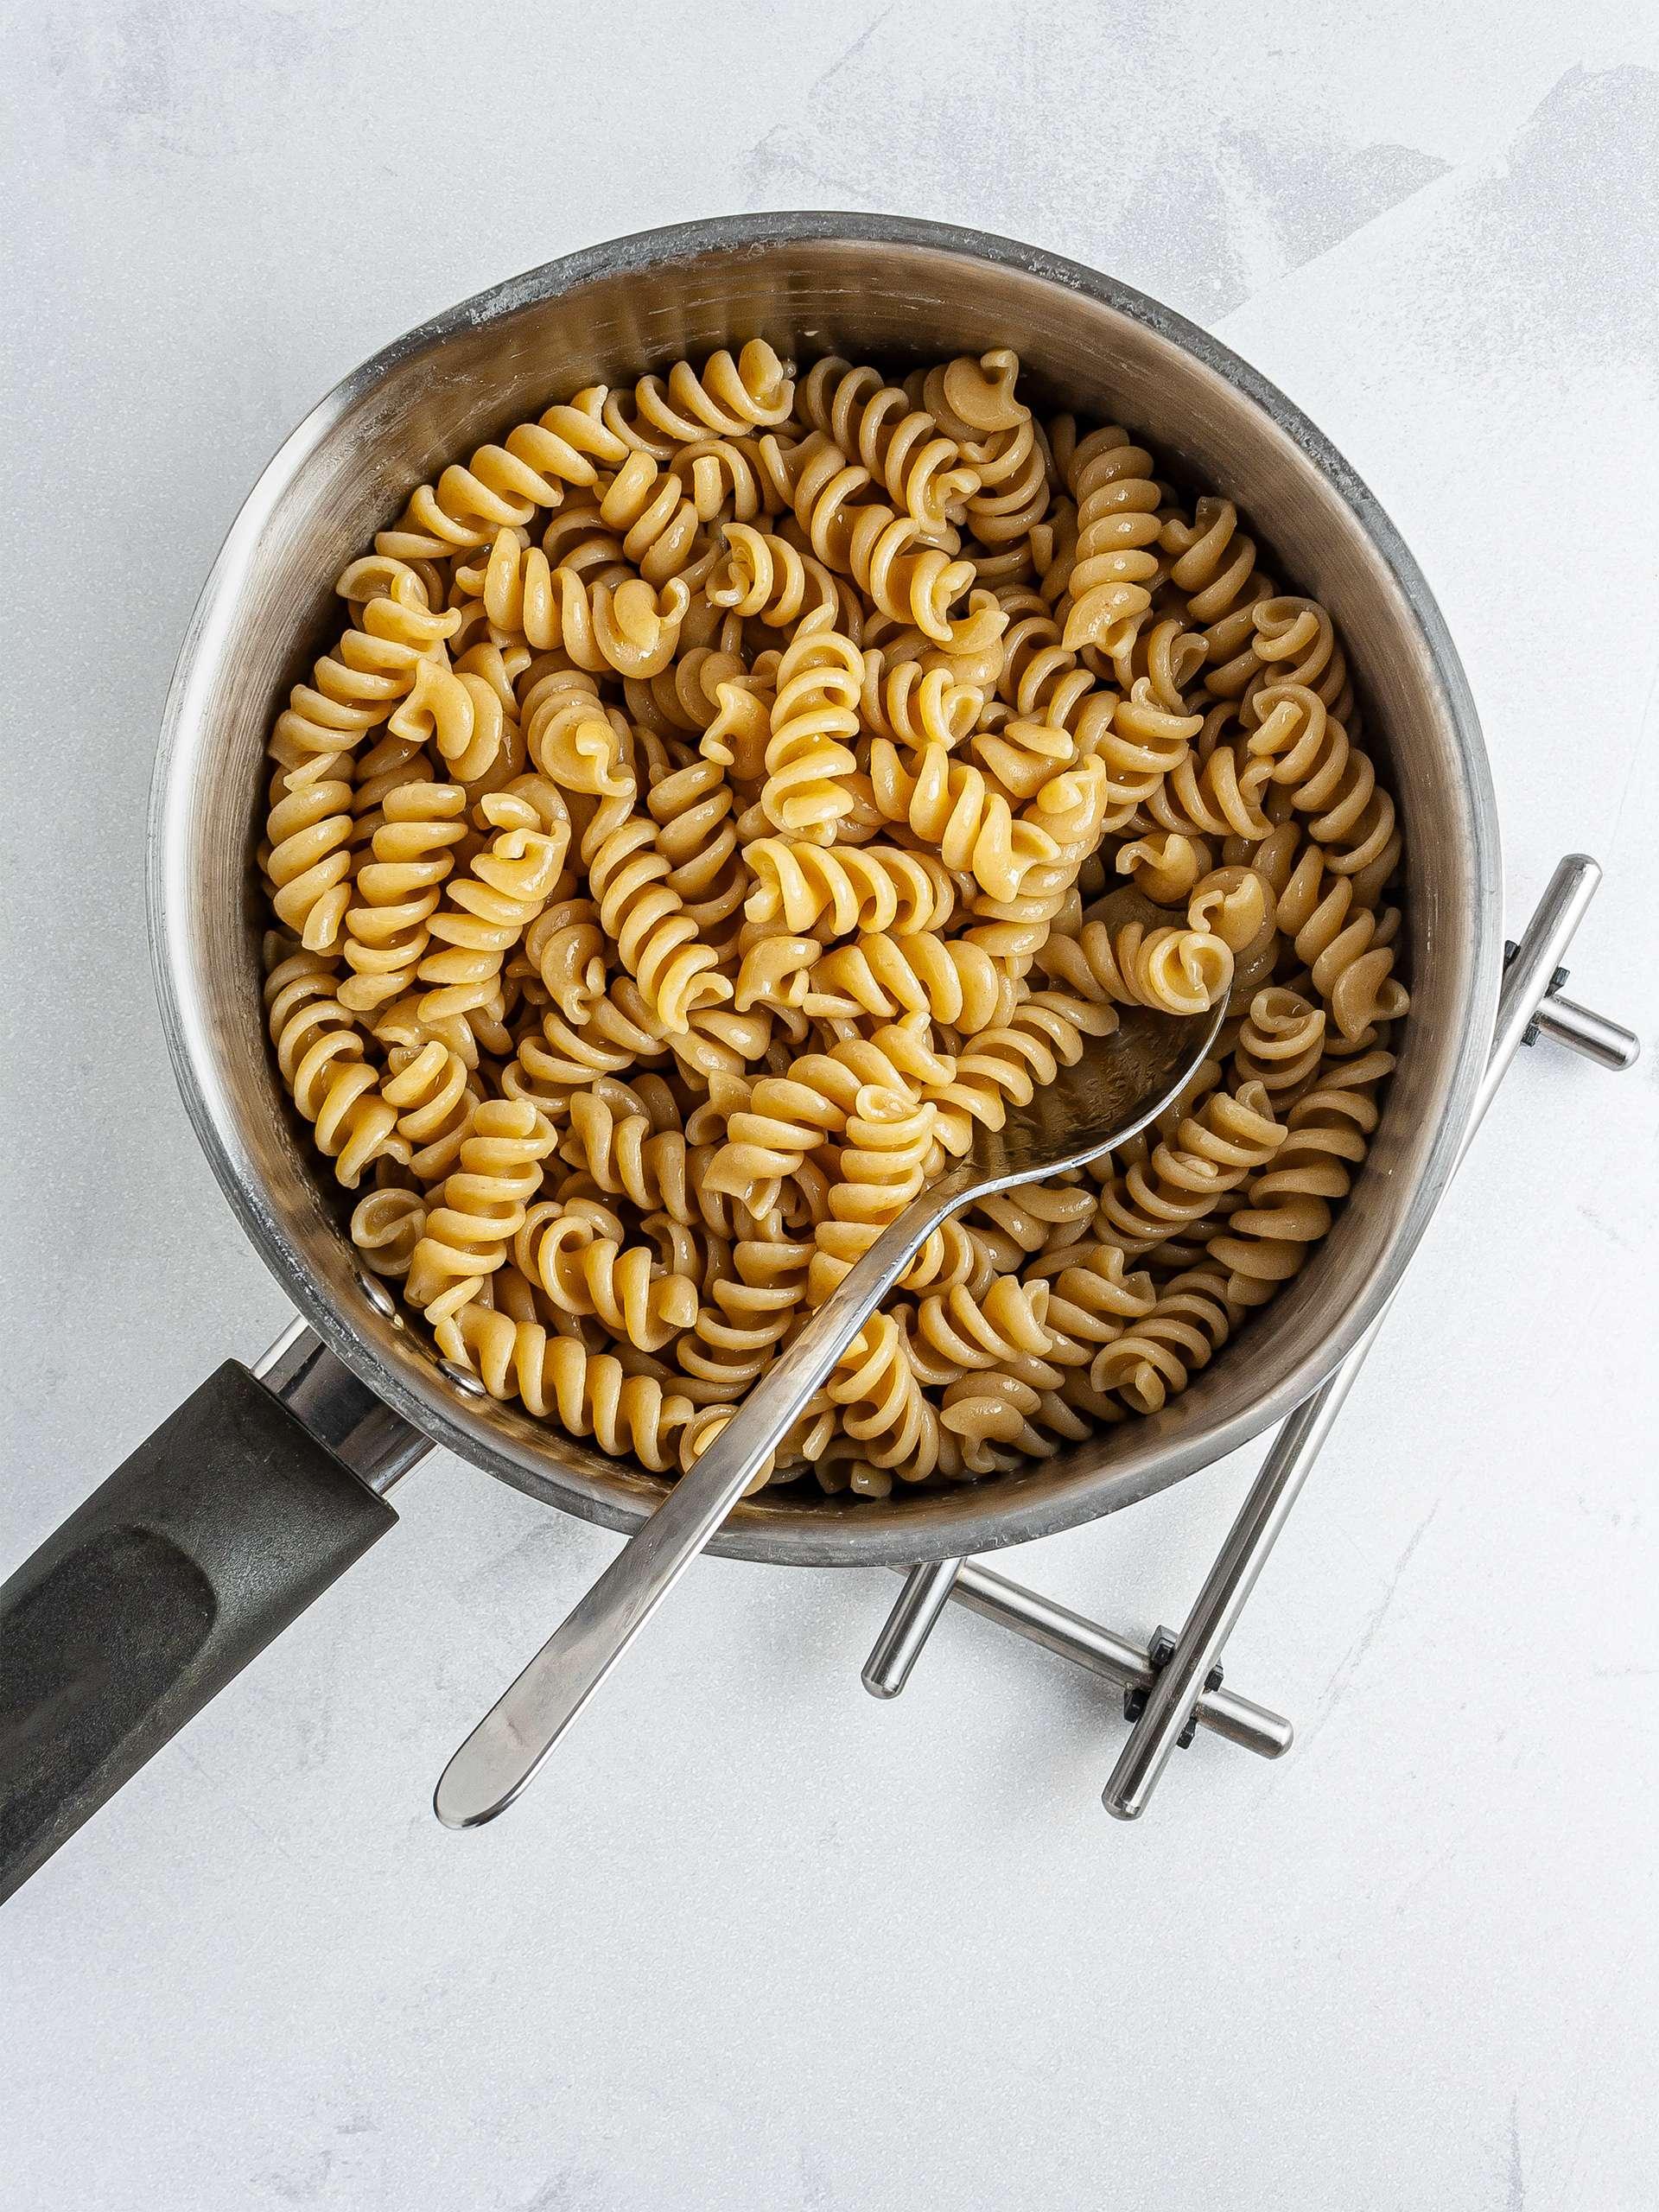 Step 1.2 of Vegan Tuna Pasta Salad Recipe